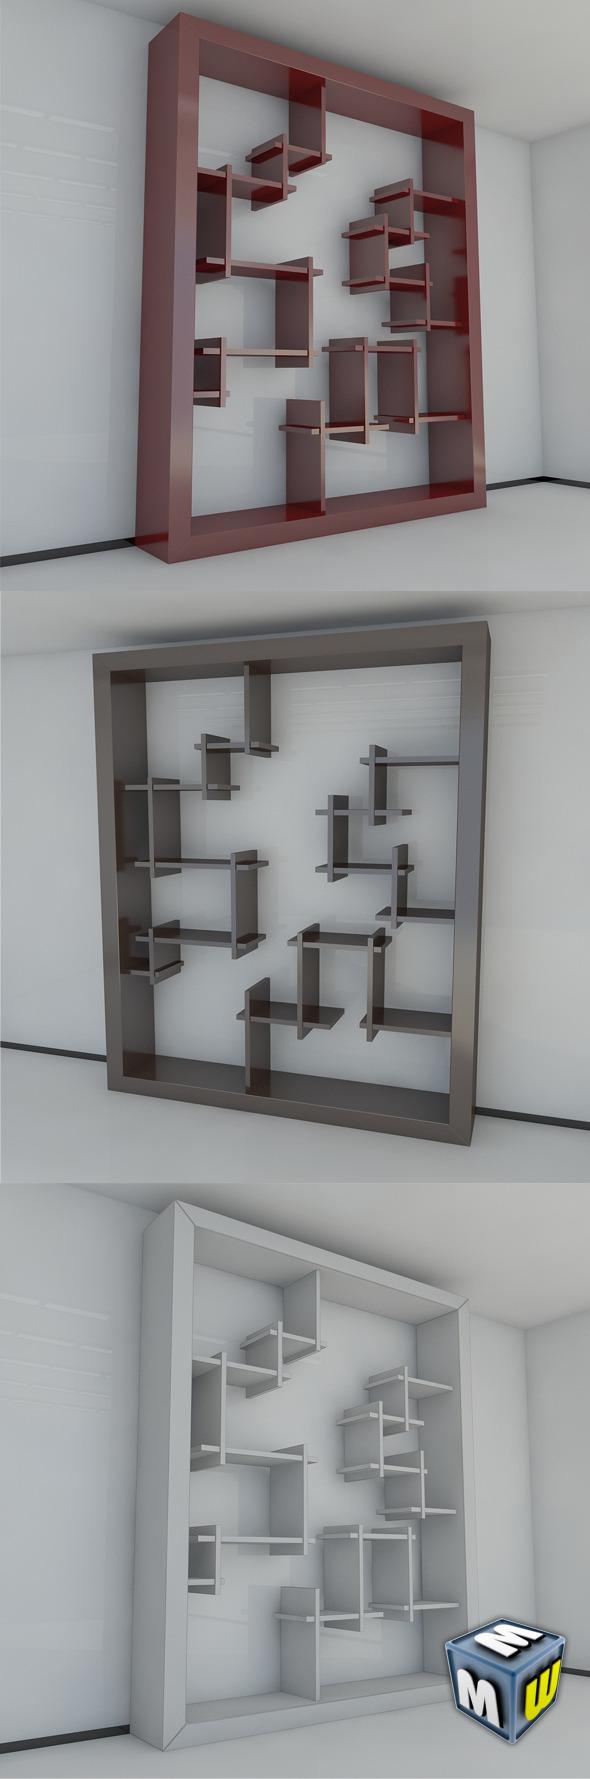 3DOcean Bookshelf 7 MAX 2011 5004188